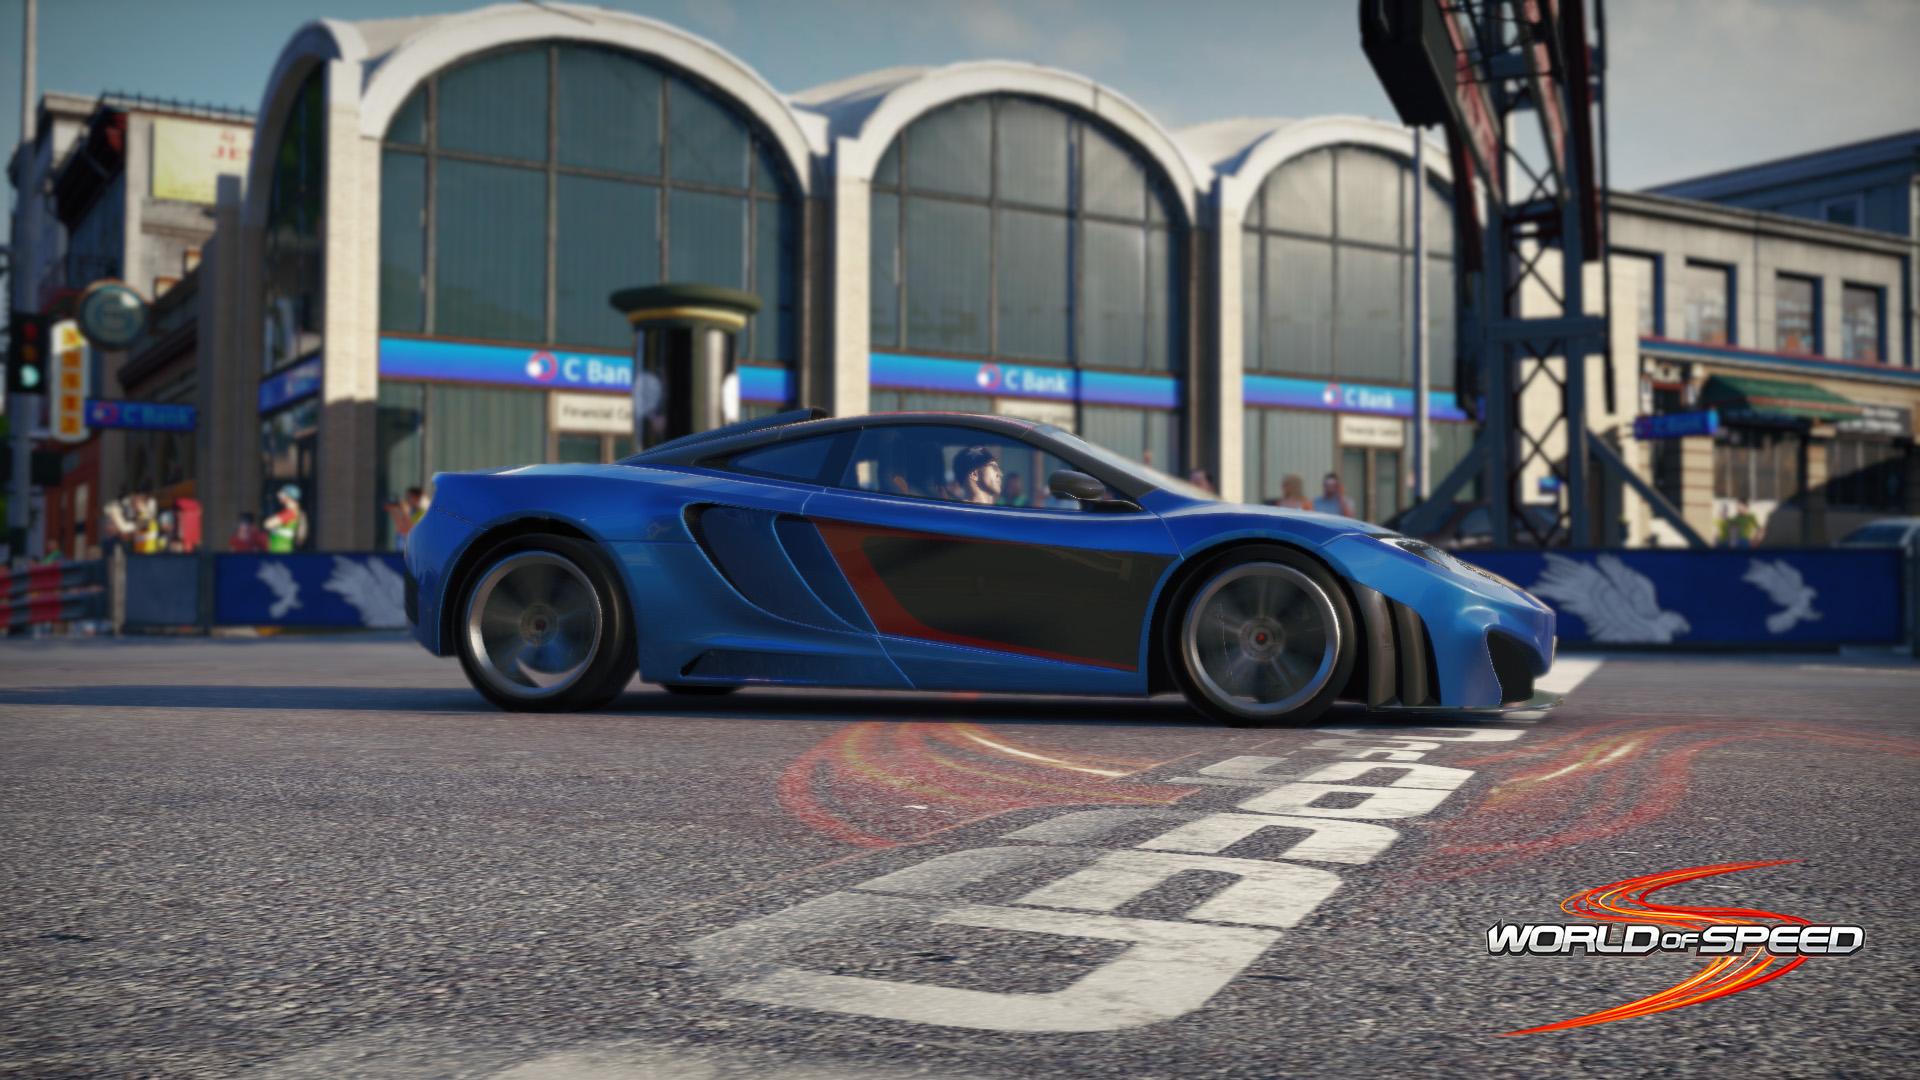 World of Speed